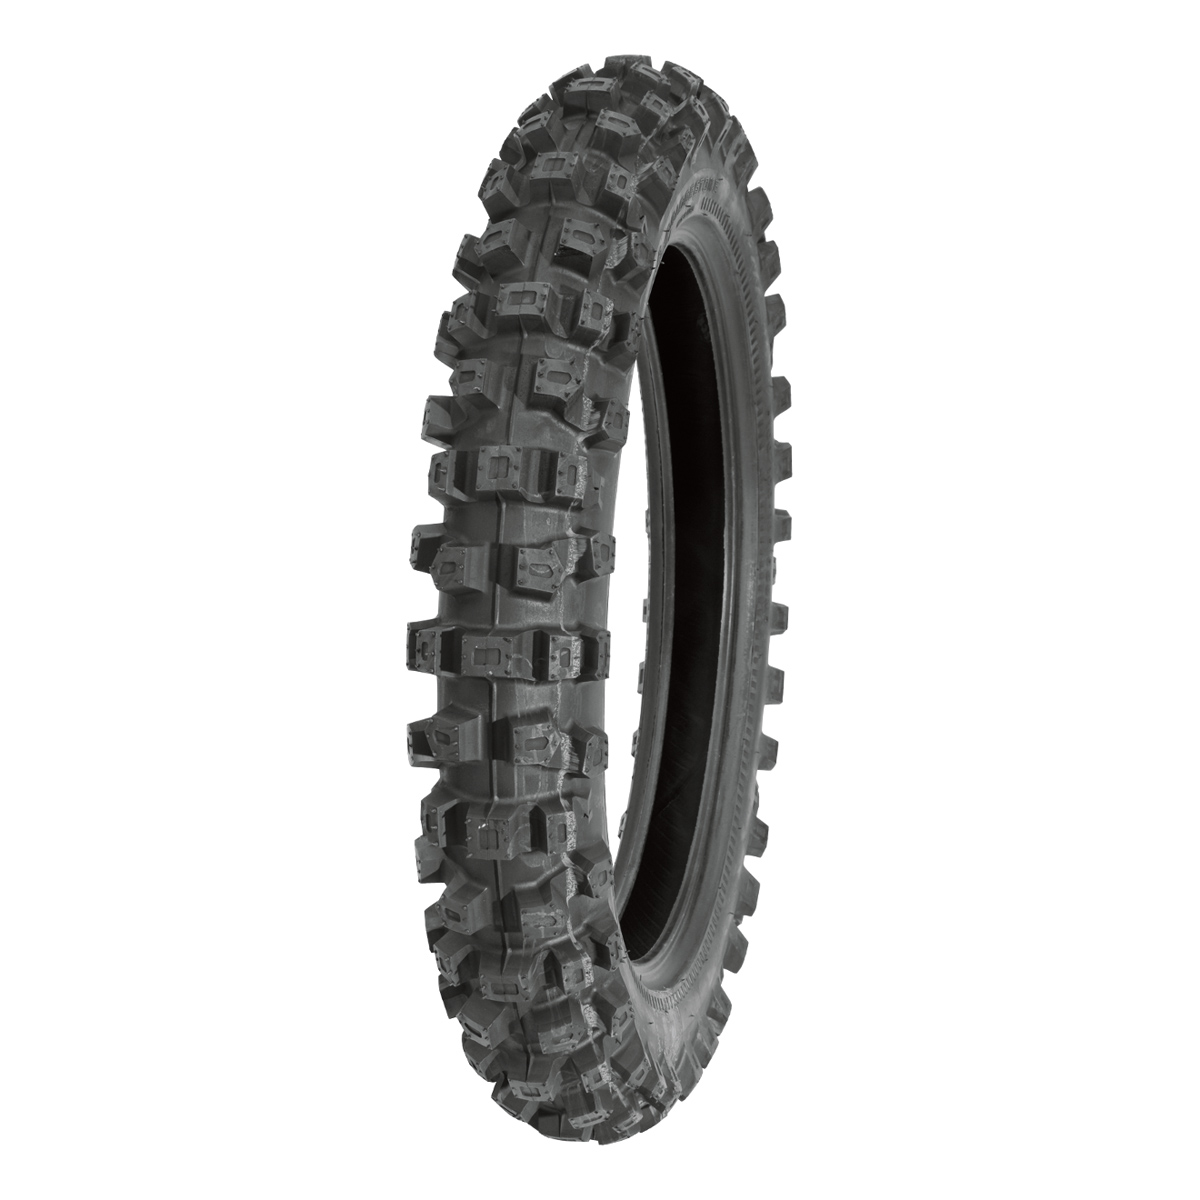 Bridgestone M22 3.00-16 H/T Rear Tire